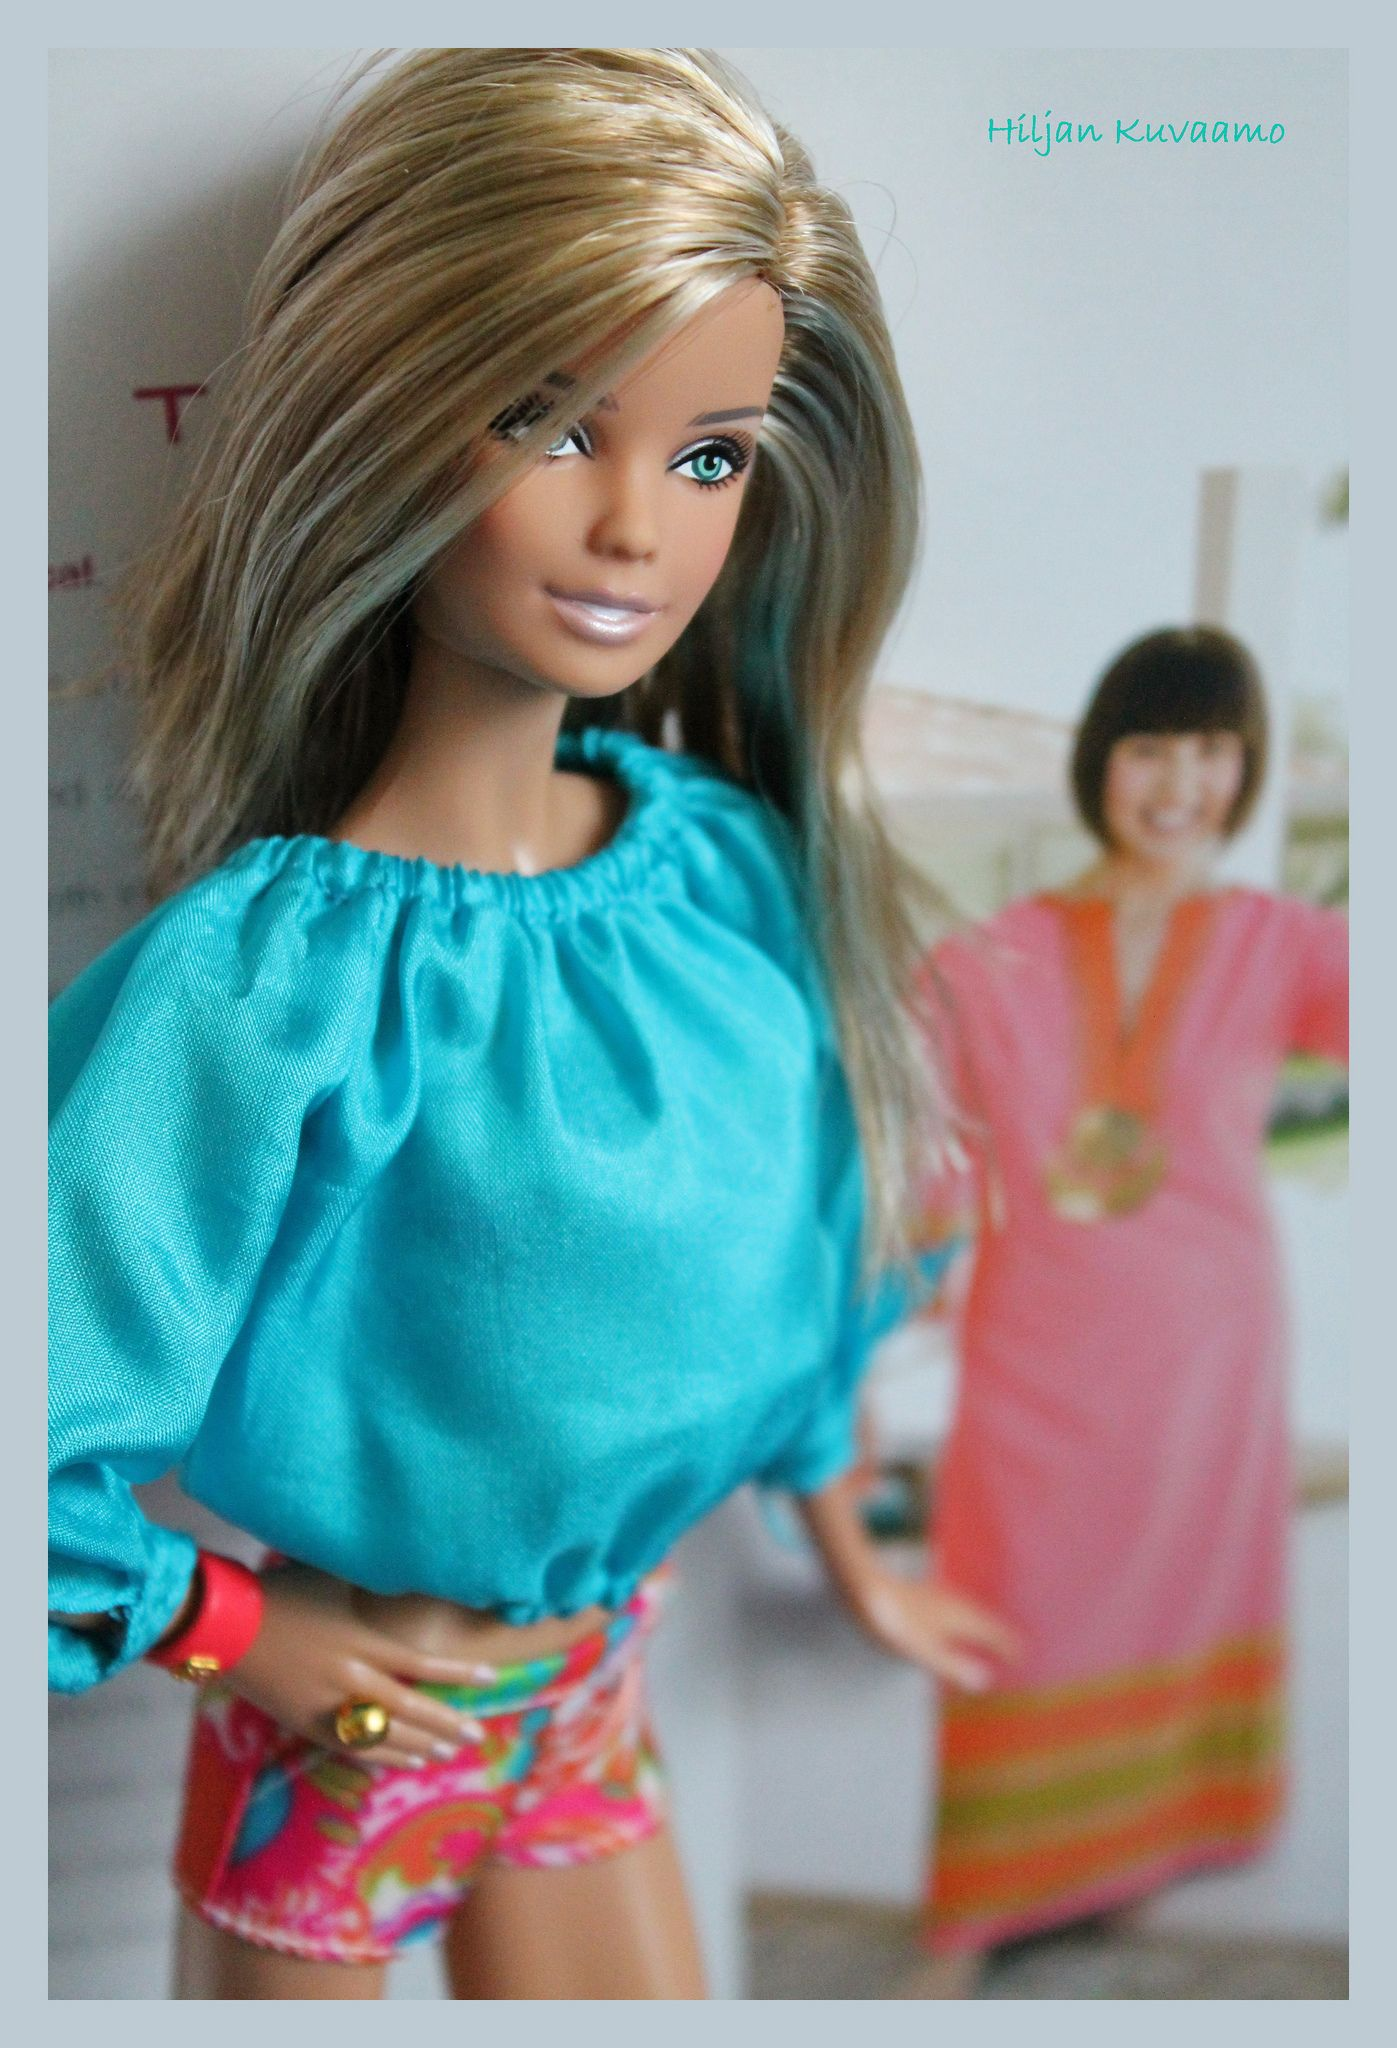 """Malibu Barbie 2013"" by Trina Turk | Posted by Hiljan Kuvaamo | 8 August 2013"